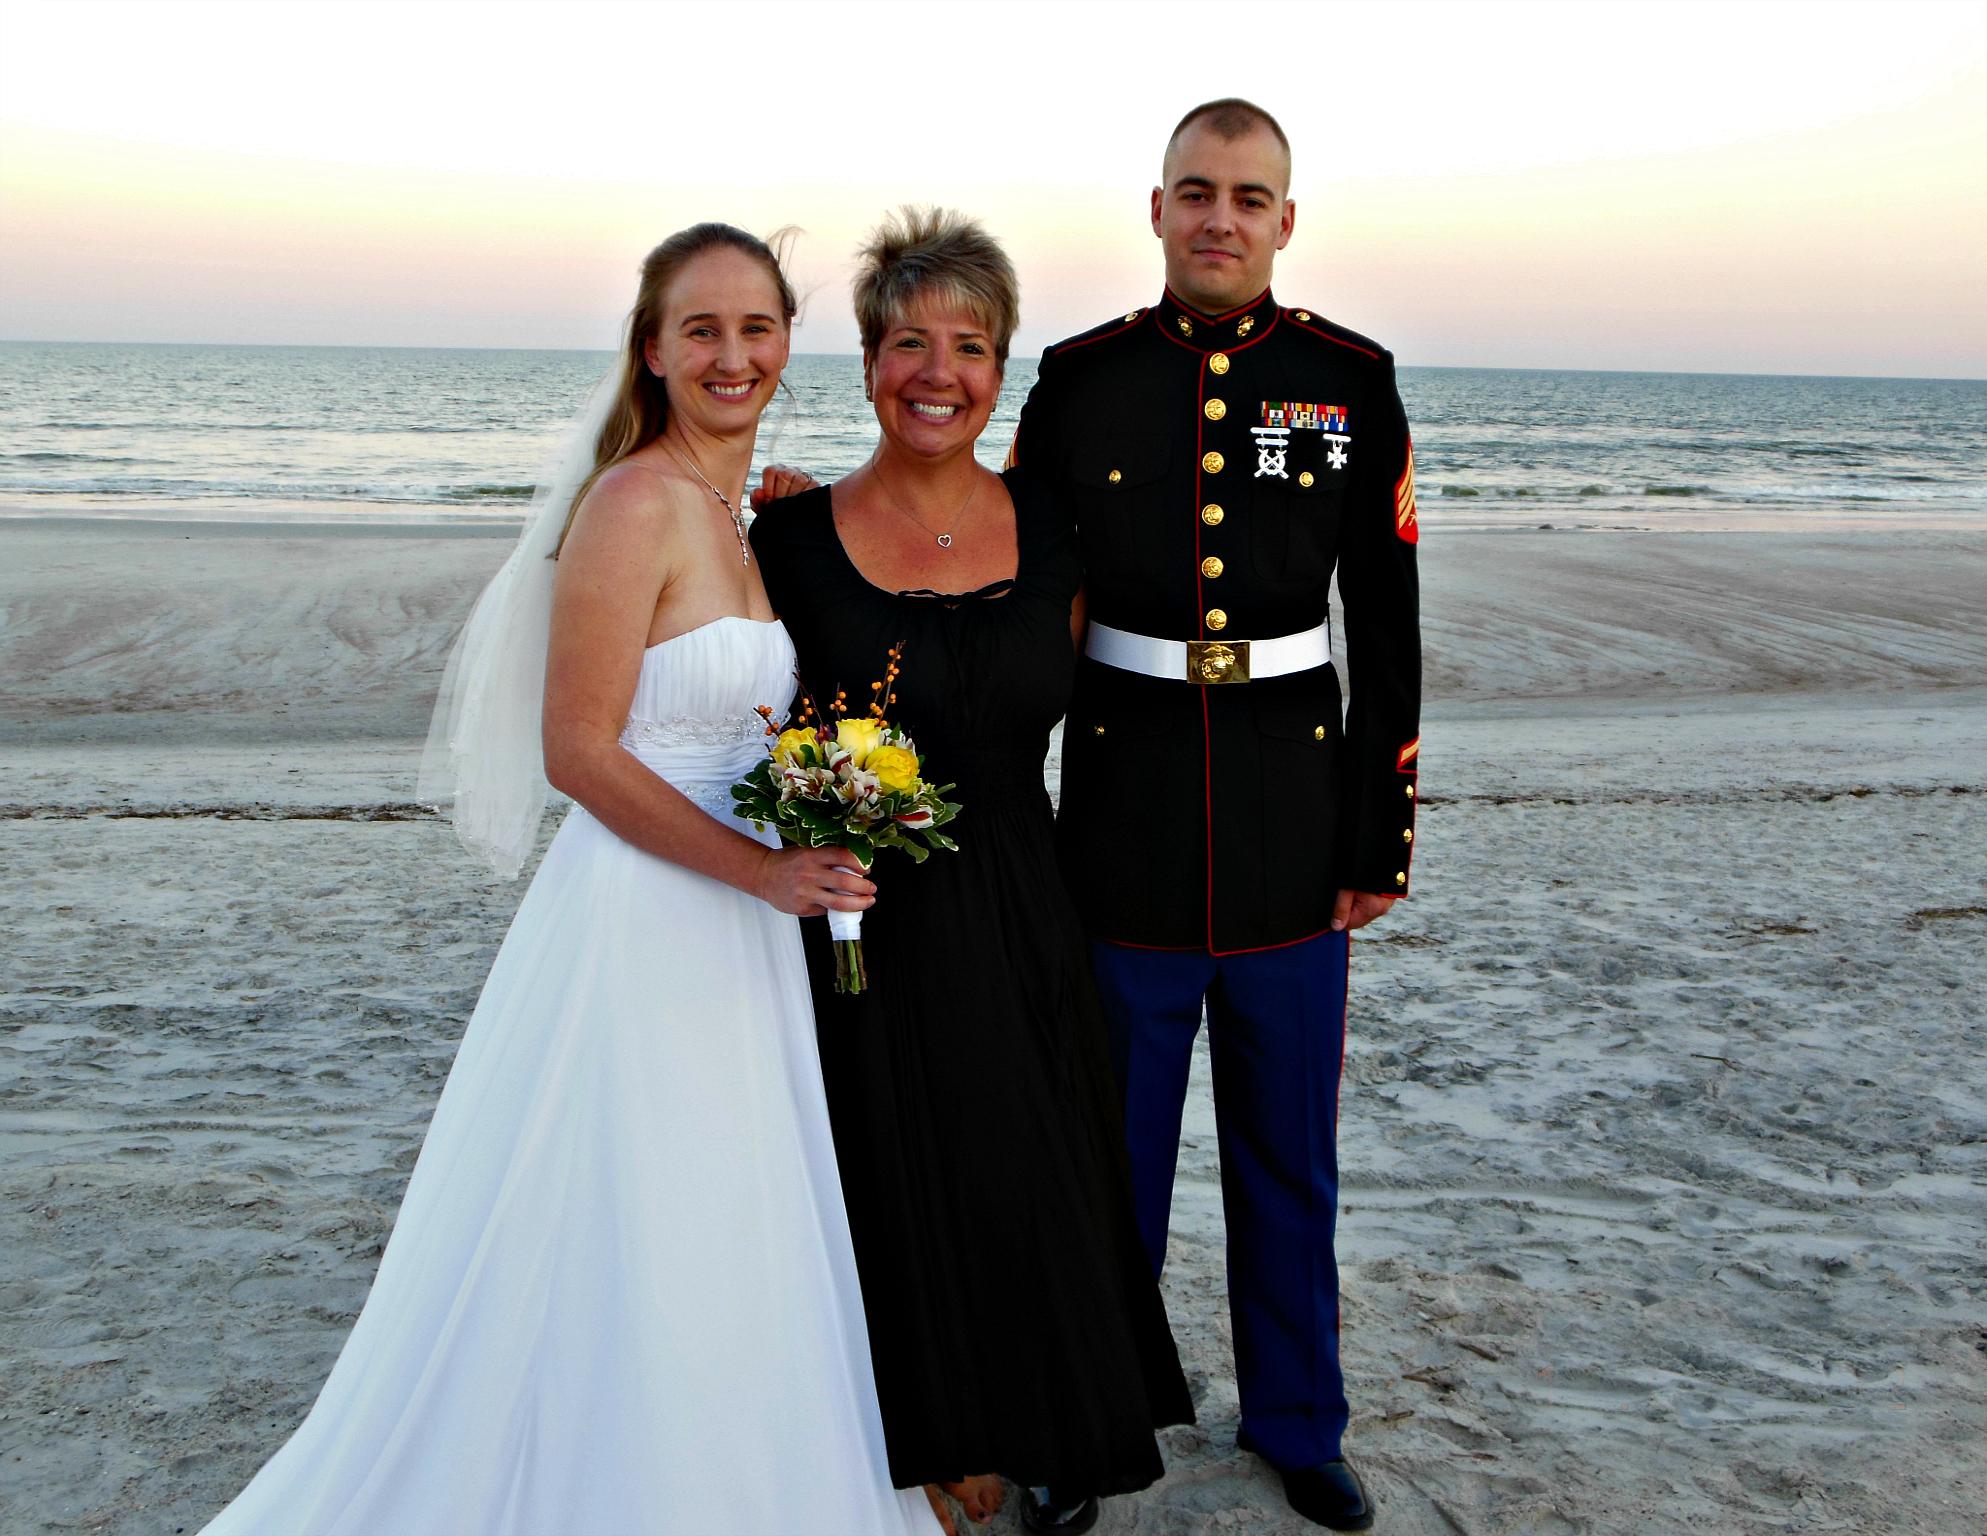 Mr. and Mrs. Brandon Coleman